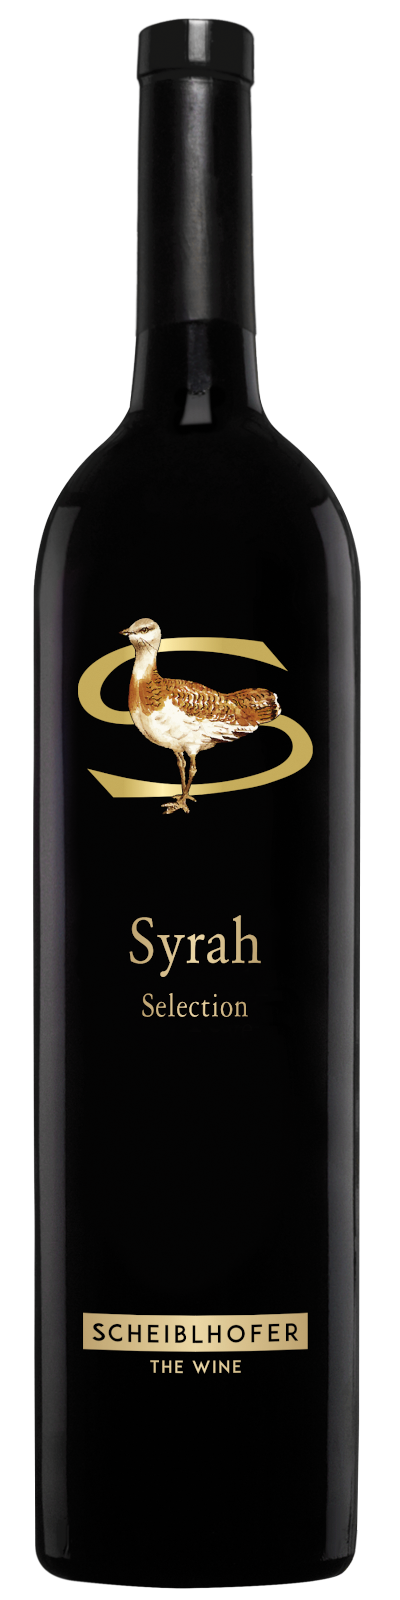 Scheiblhofer - Syrah Selection